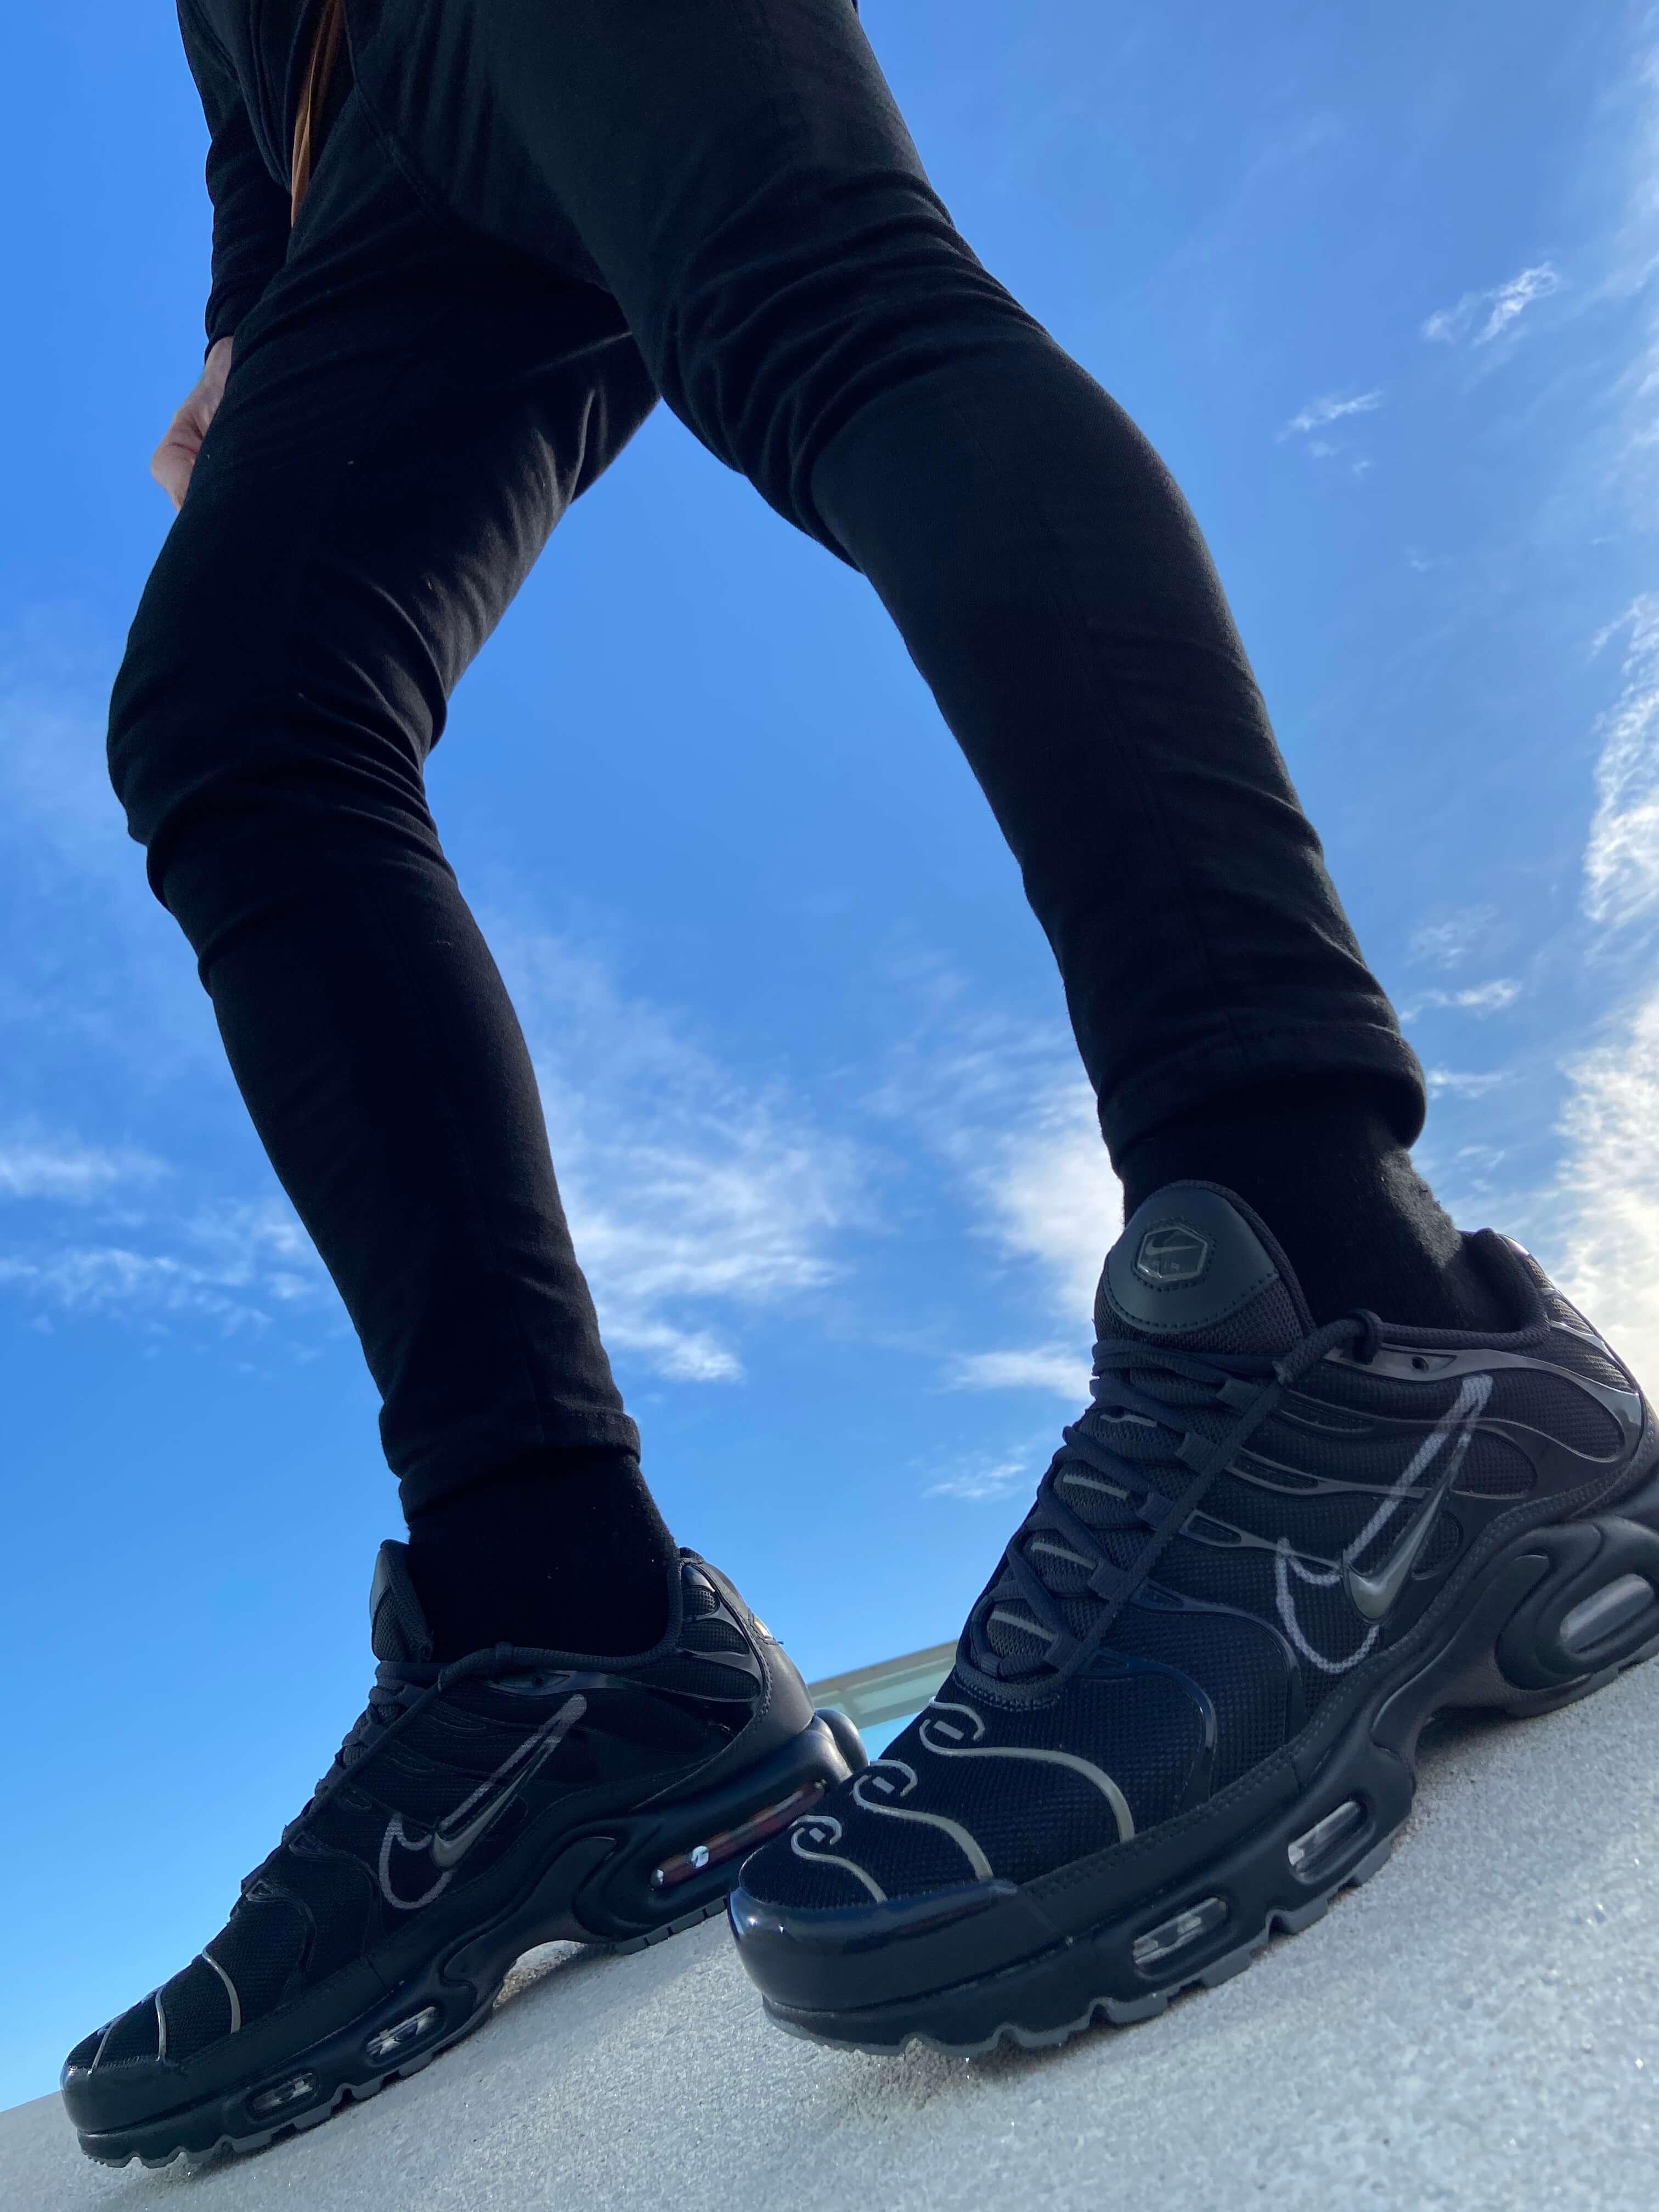 Nike Air Max Plus Black